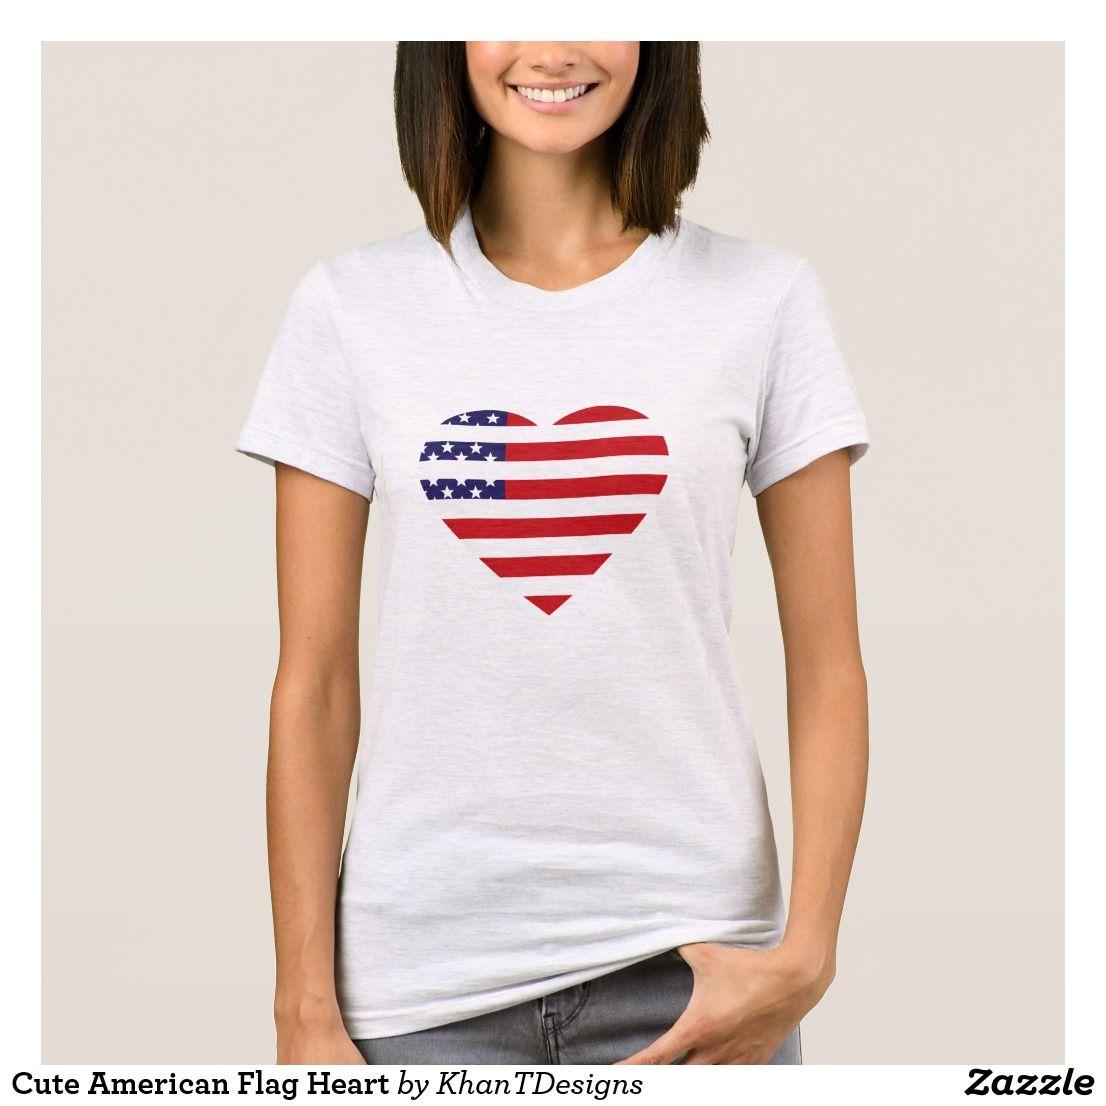 Cute American Flag Heart T Shirt Zazzle Com American Shirts T Shirts For Women American Flag Sweatshirt